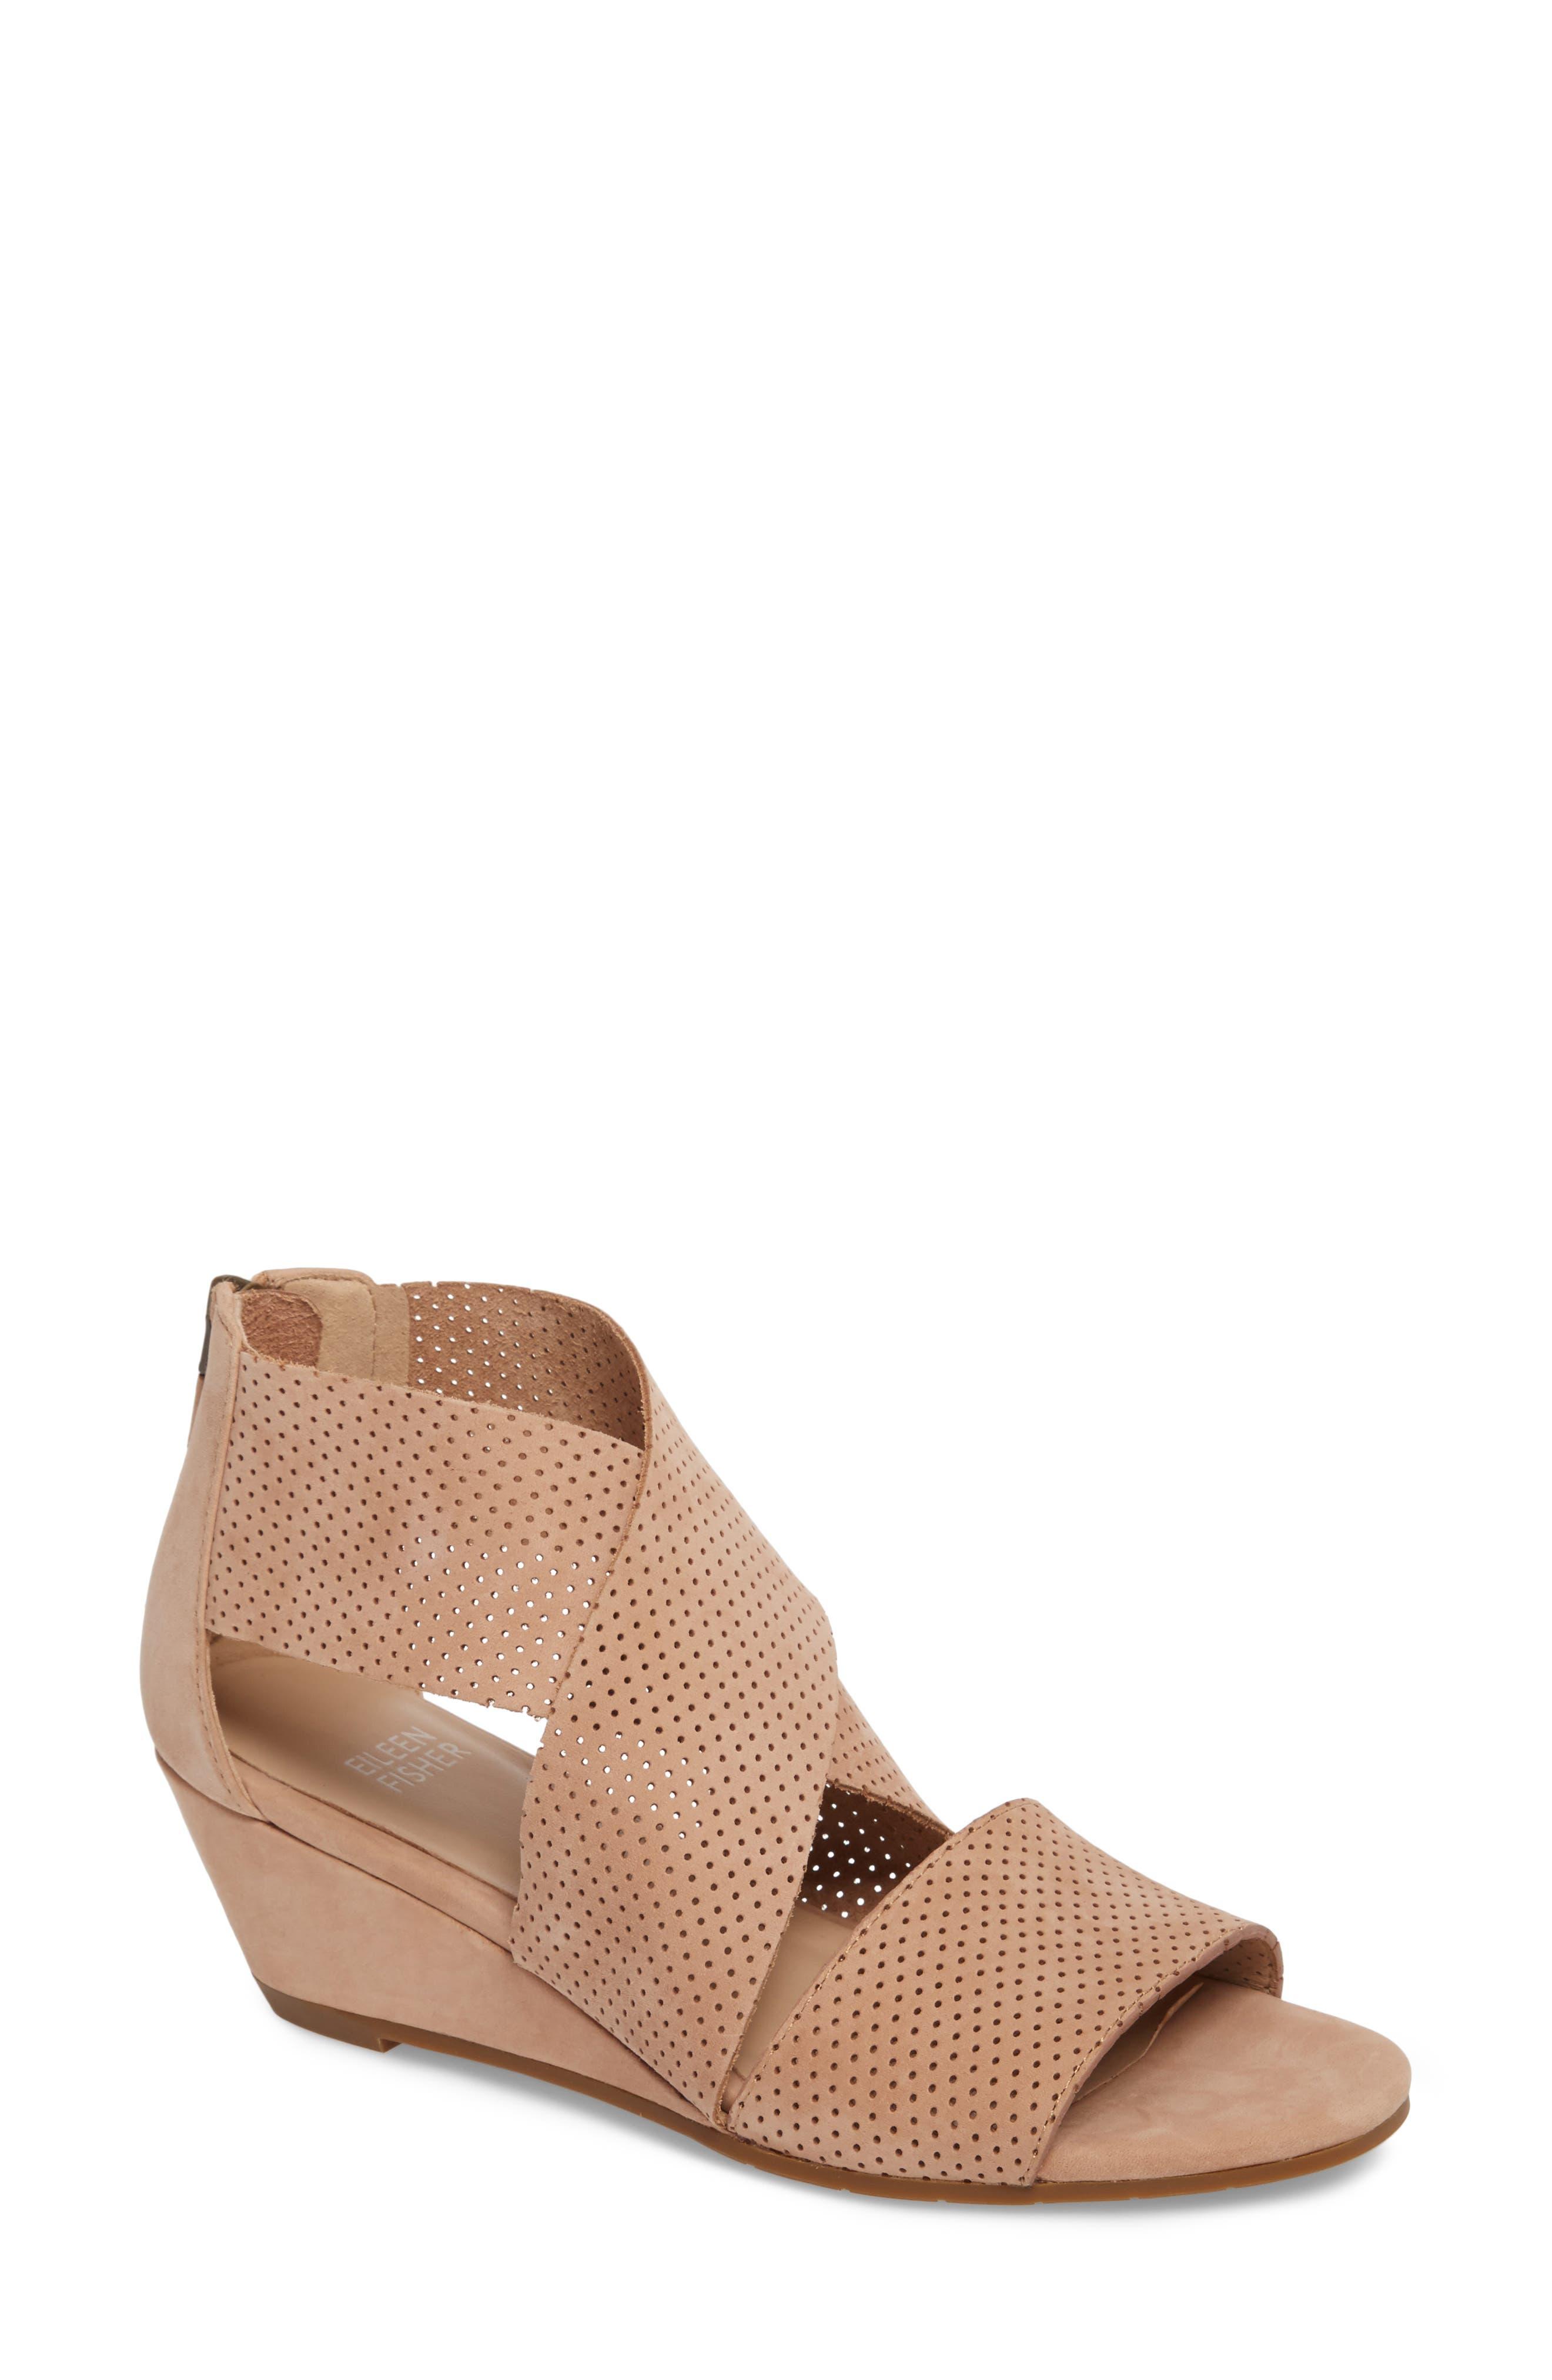 Kes Wedge Sandal,                         Main,                         color, Wheat Nubuck